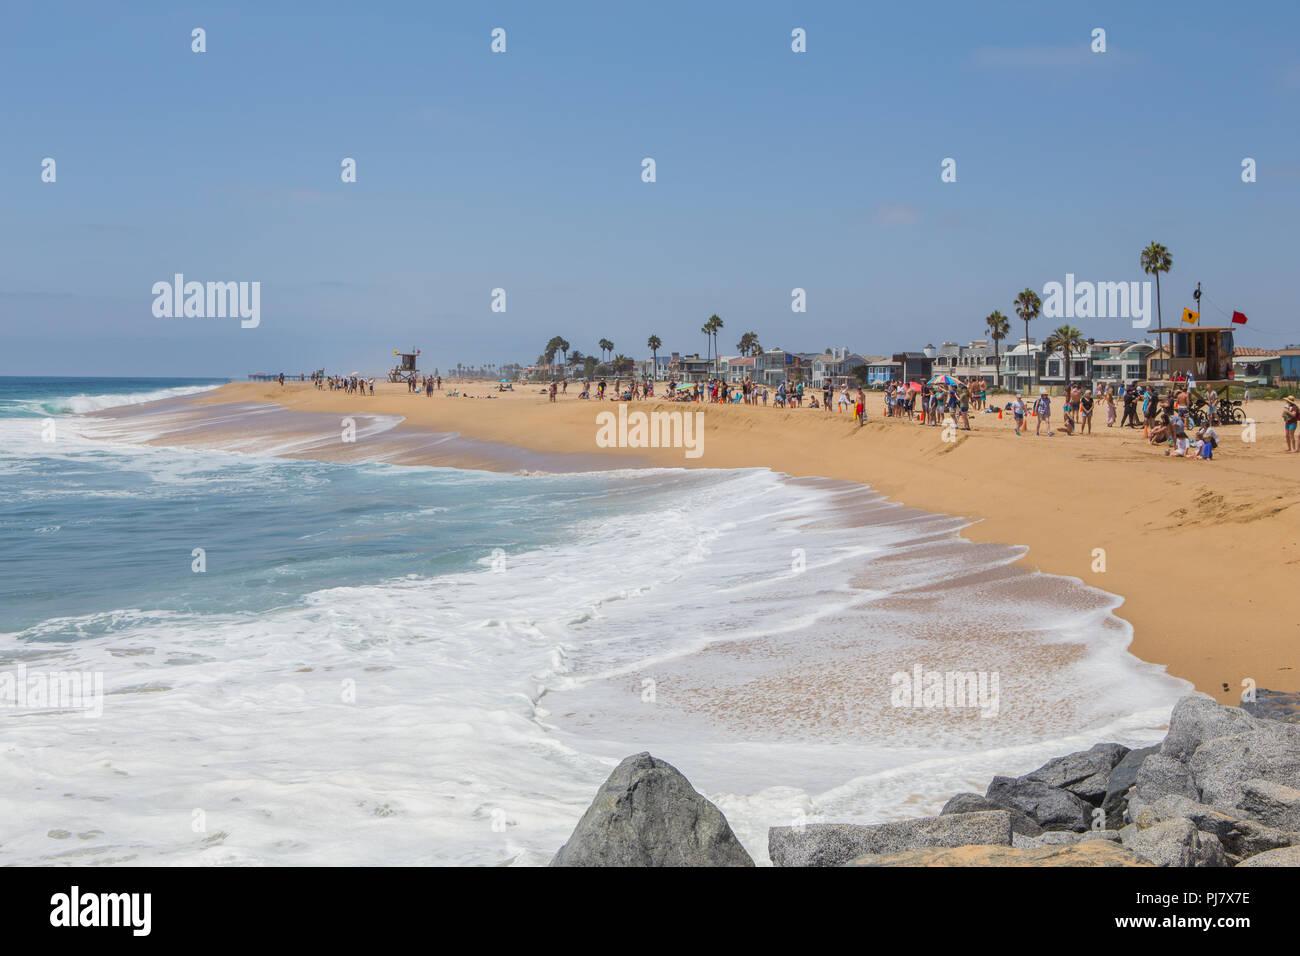 Balboa peninsular at The world famous surfing spot 'The Wedge' Newport Beach California USA - Stock Image